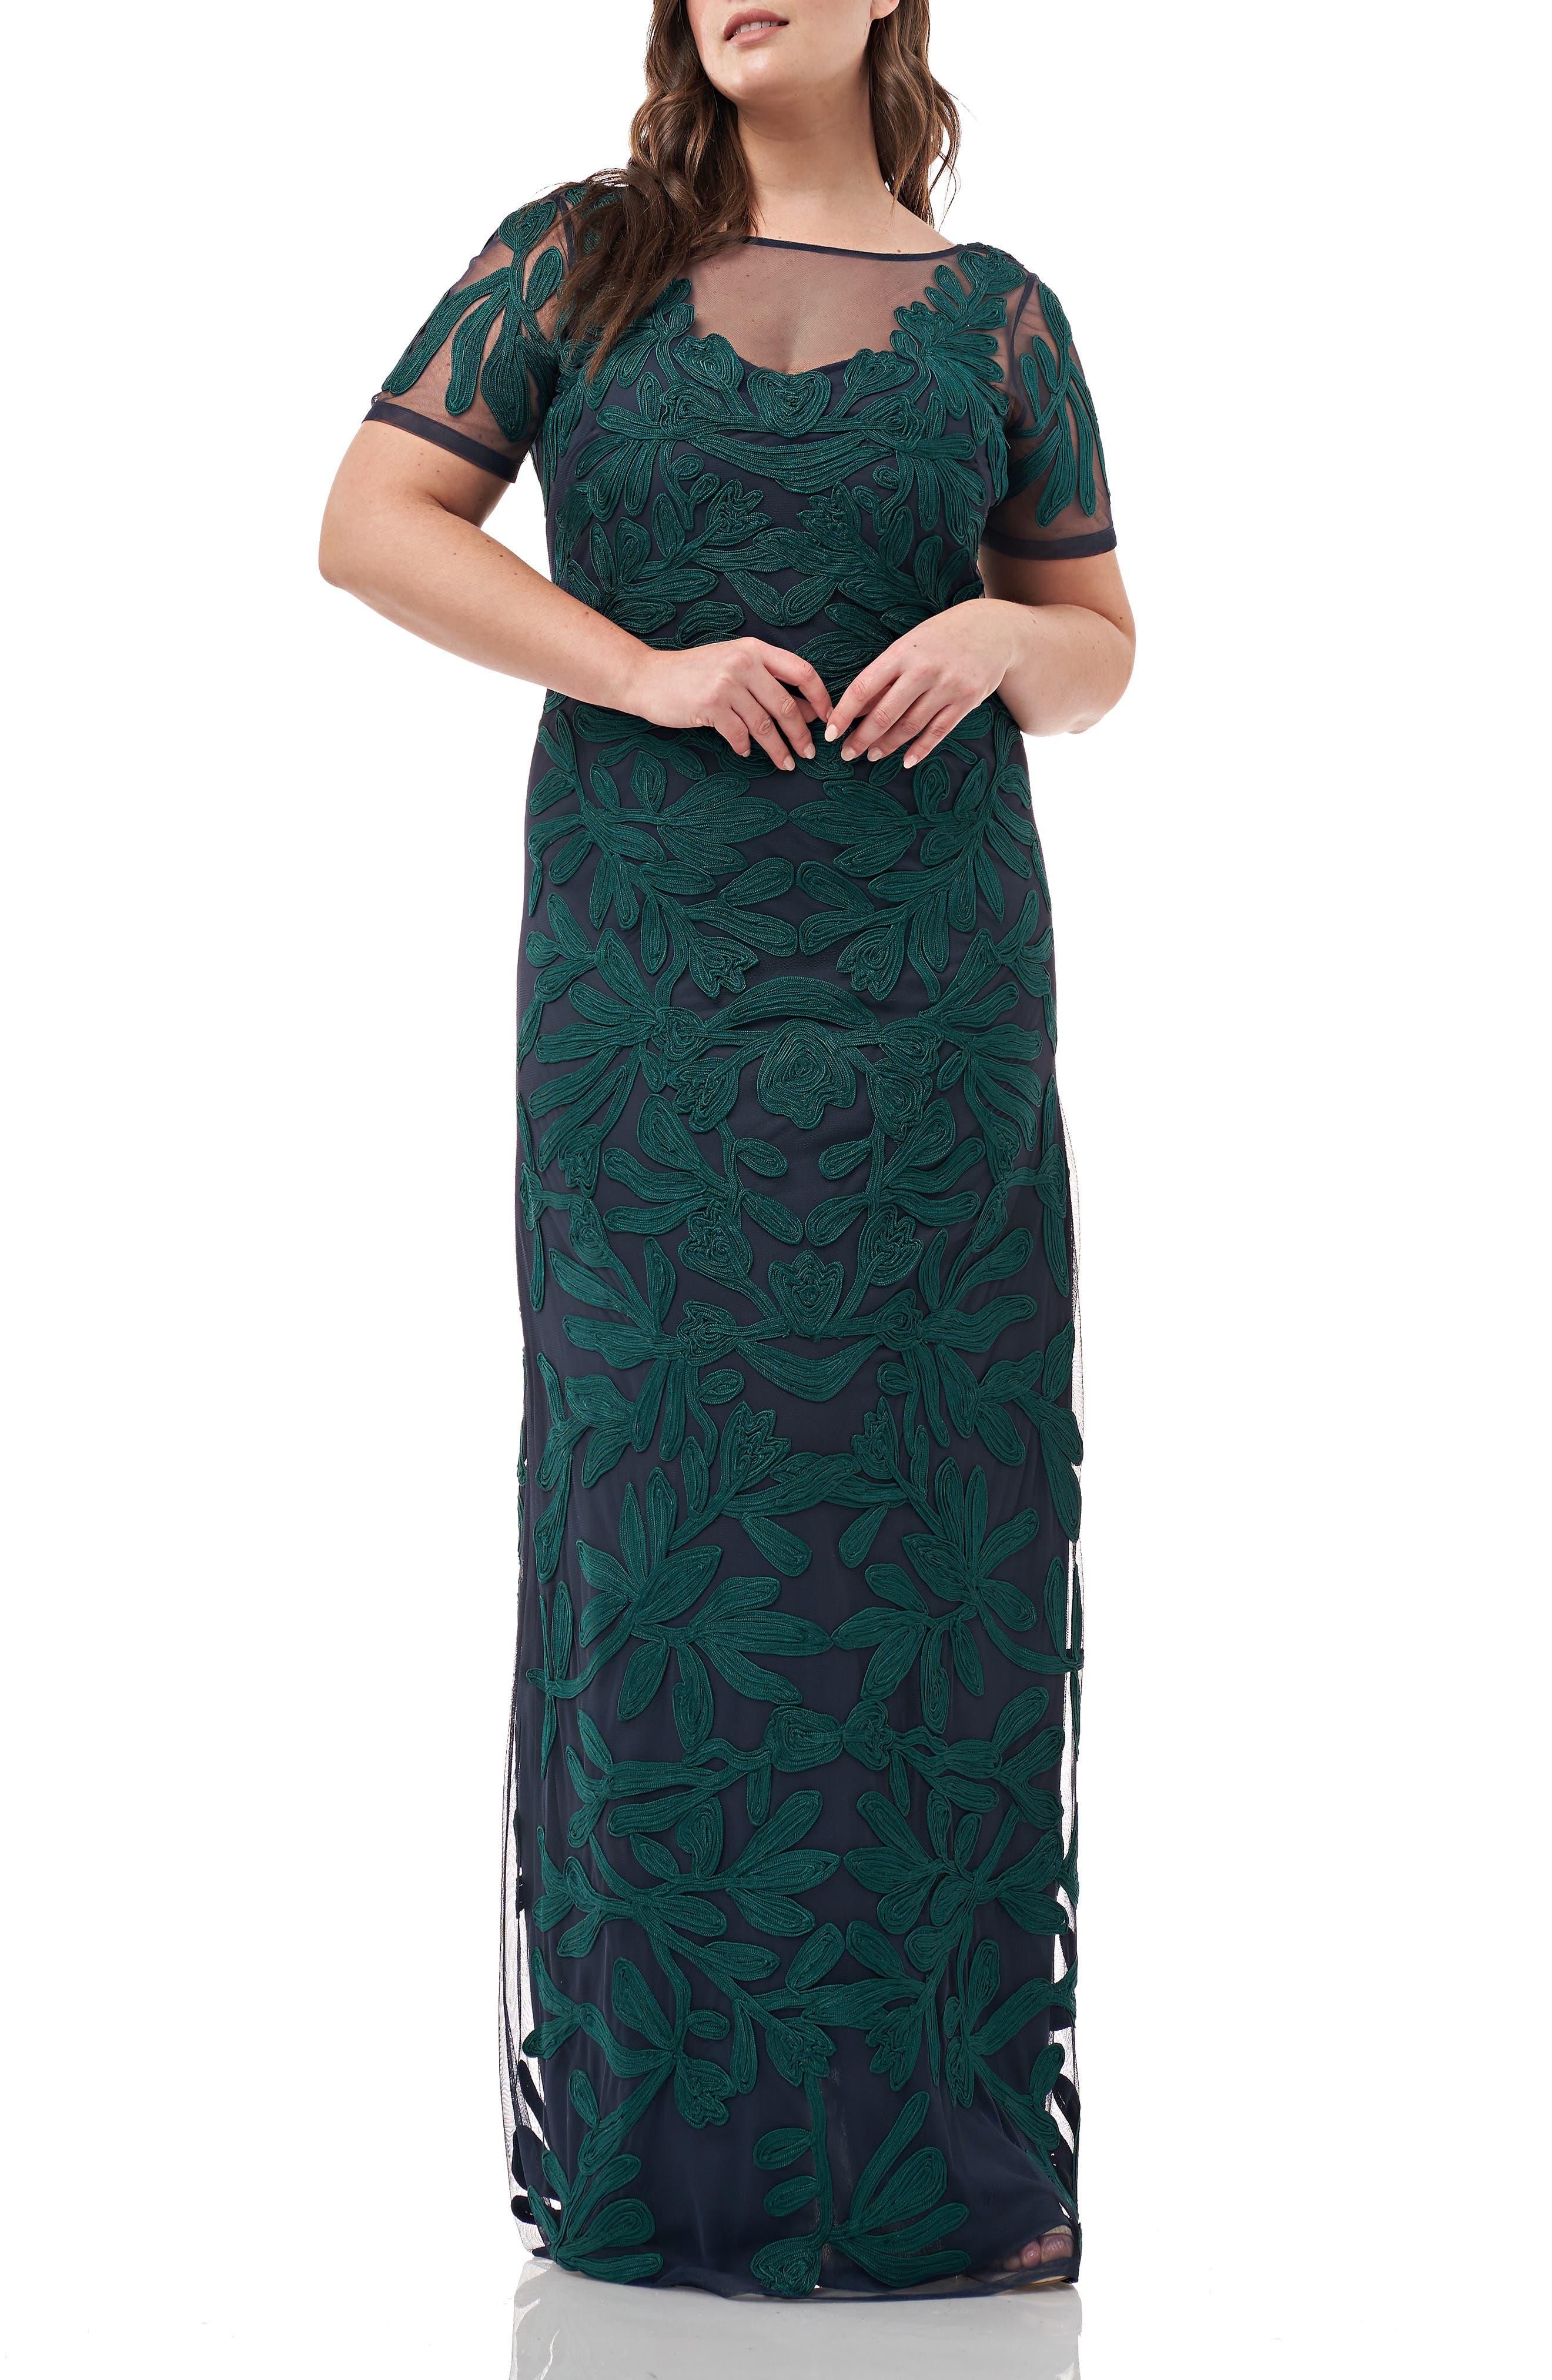 1920s Evening Dresses & Formal Gowns Plus Size Womens Js Collections Illusion Soutache Evening Dress Size 22W - Green $388.00 AT vintagedancer.com